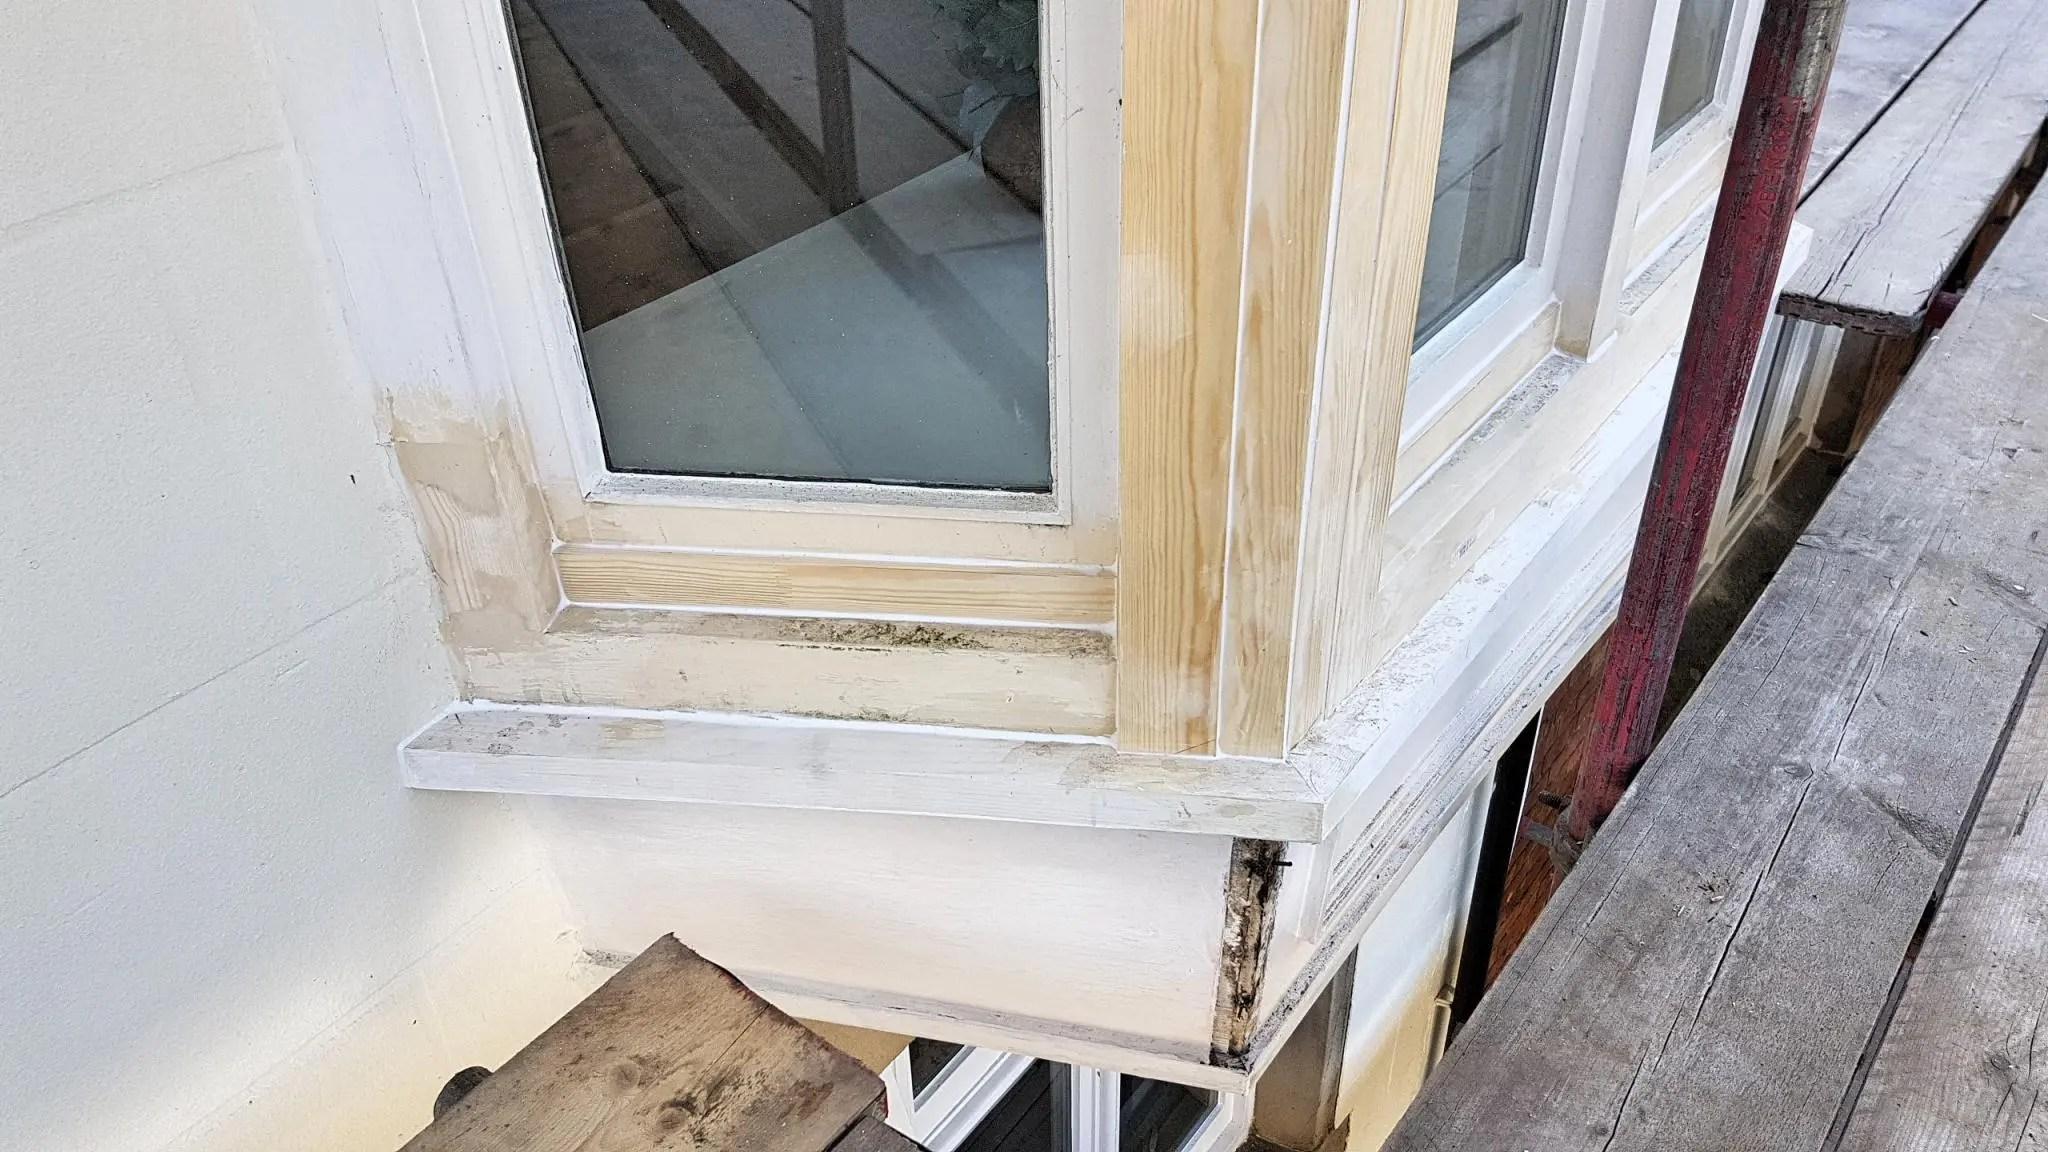 Shotton Hall Rotten Bay Window Repair